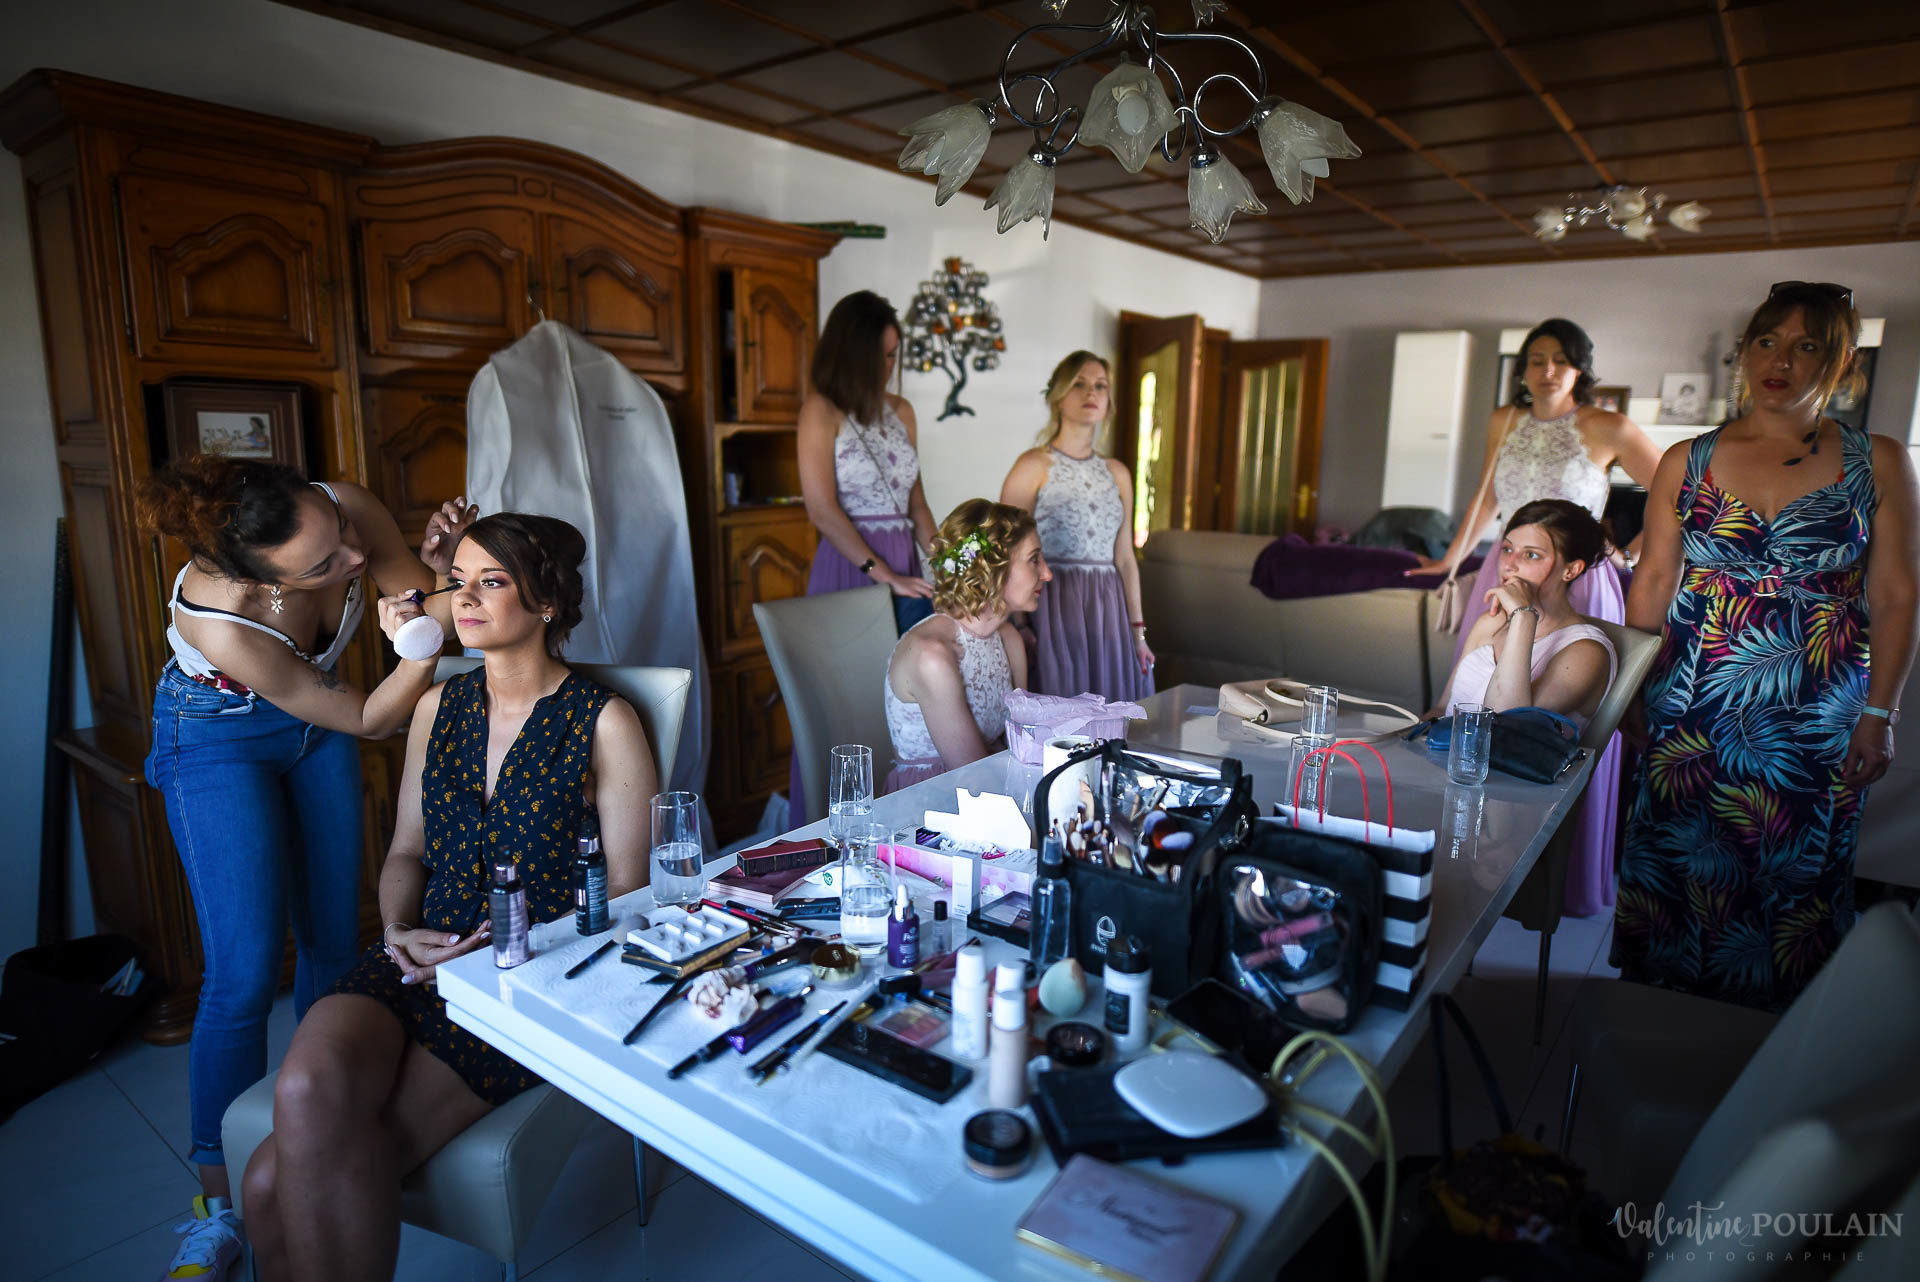 Mariage convivial Saverne - Valentine Poulain preparatifs